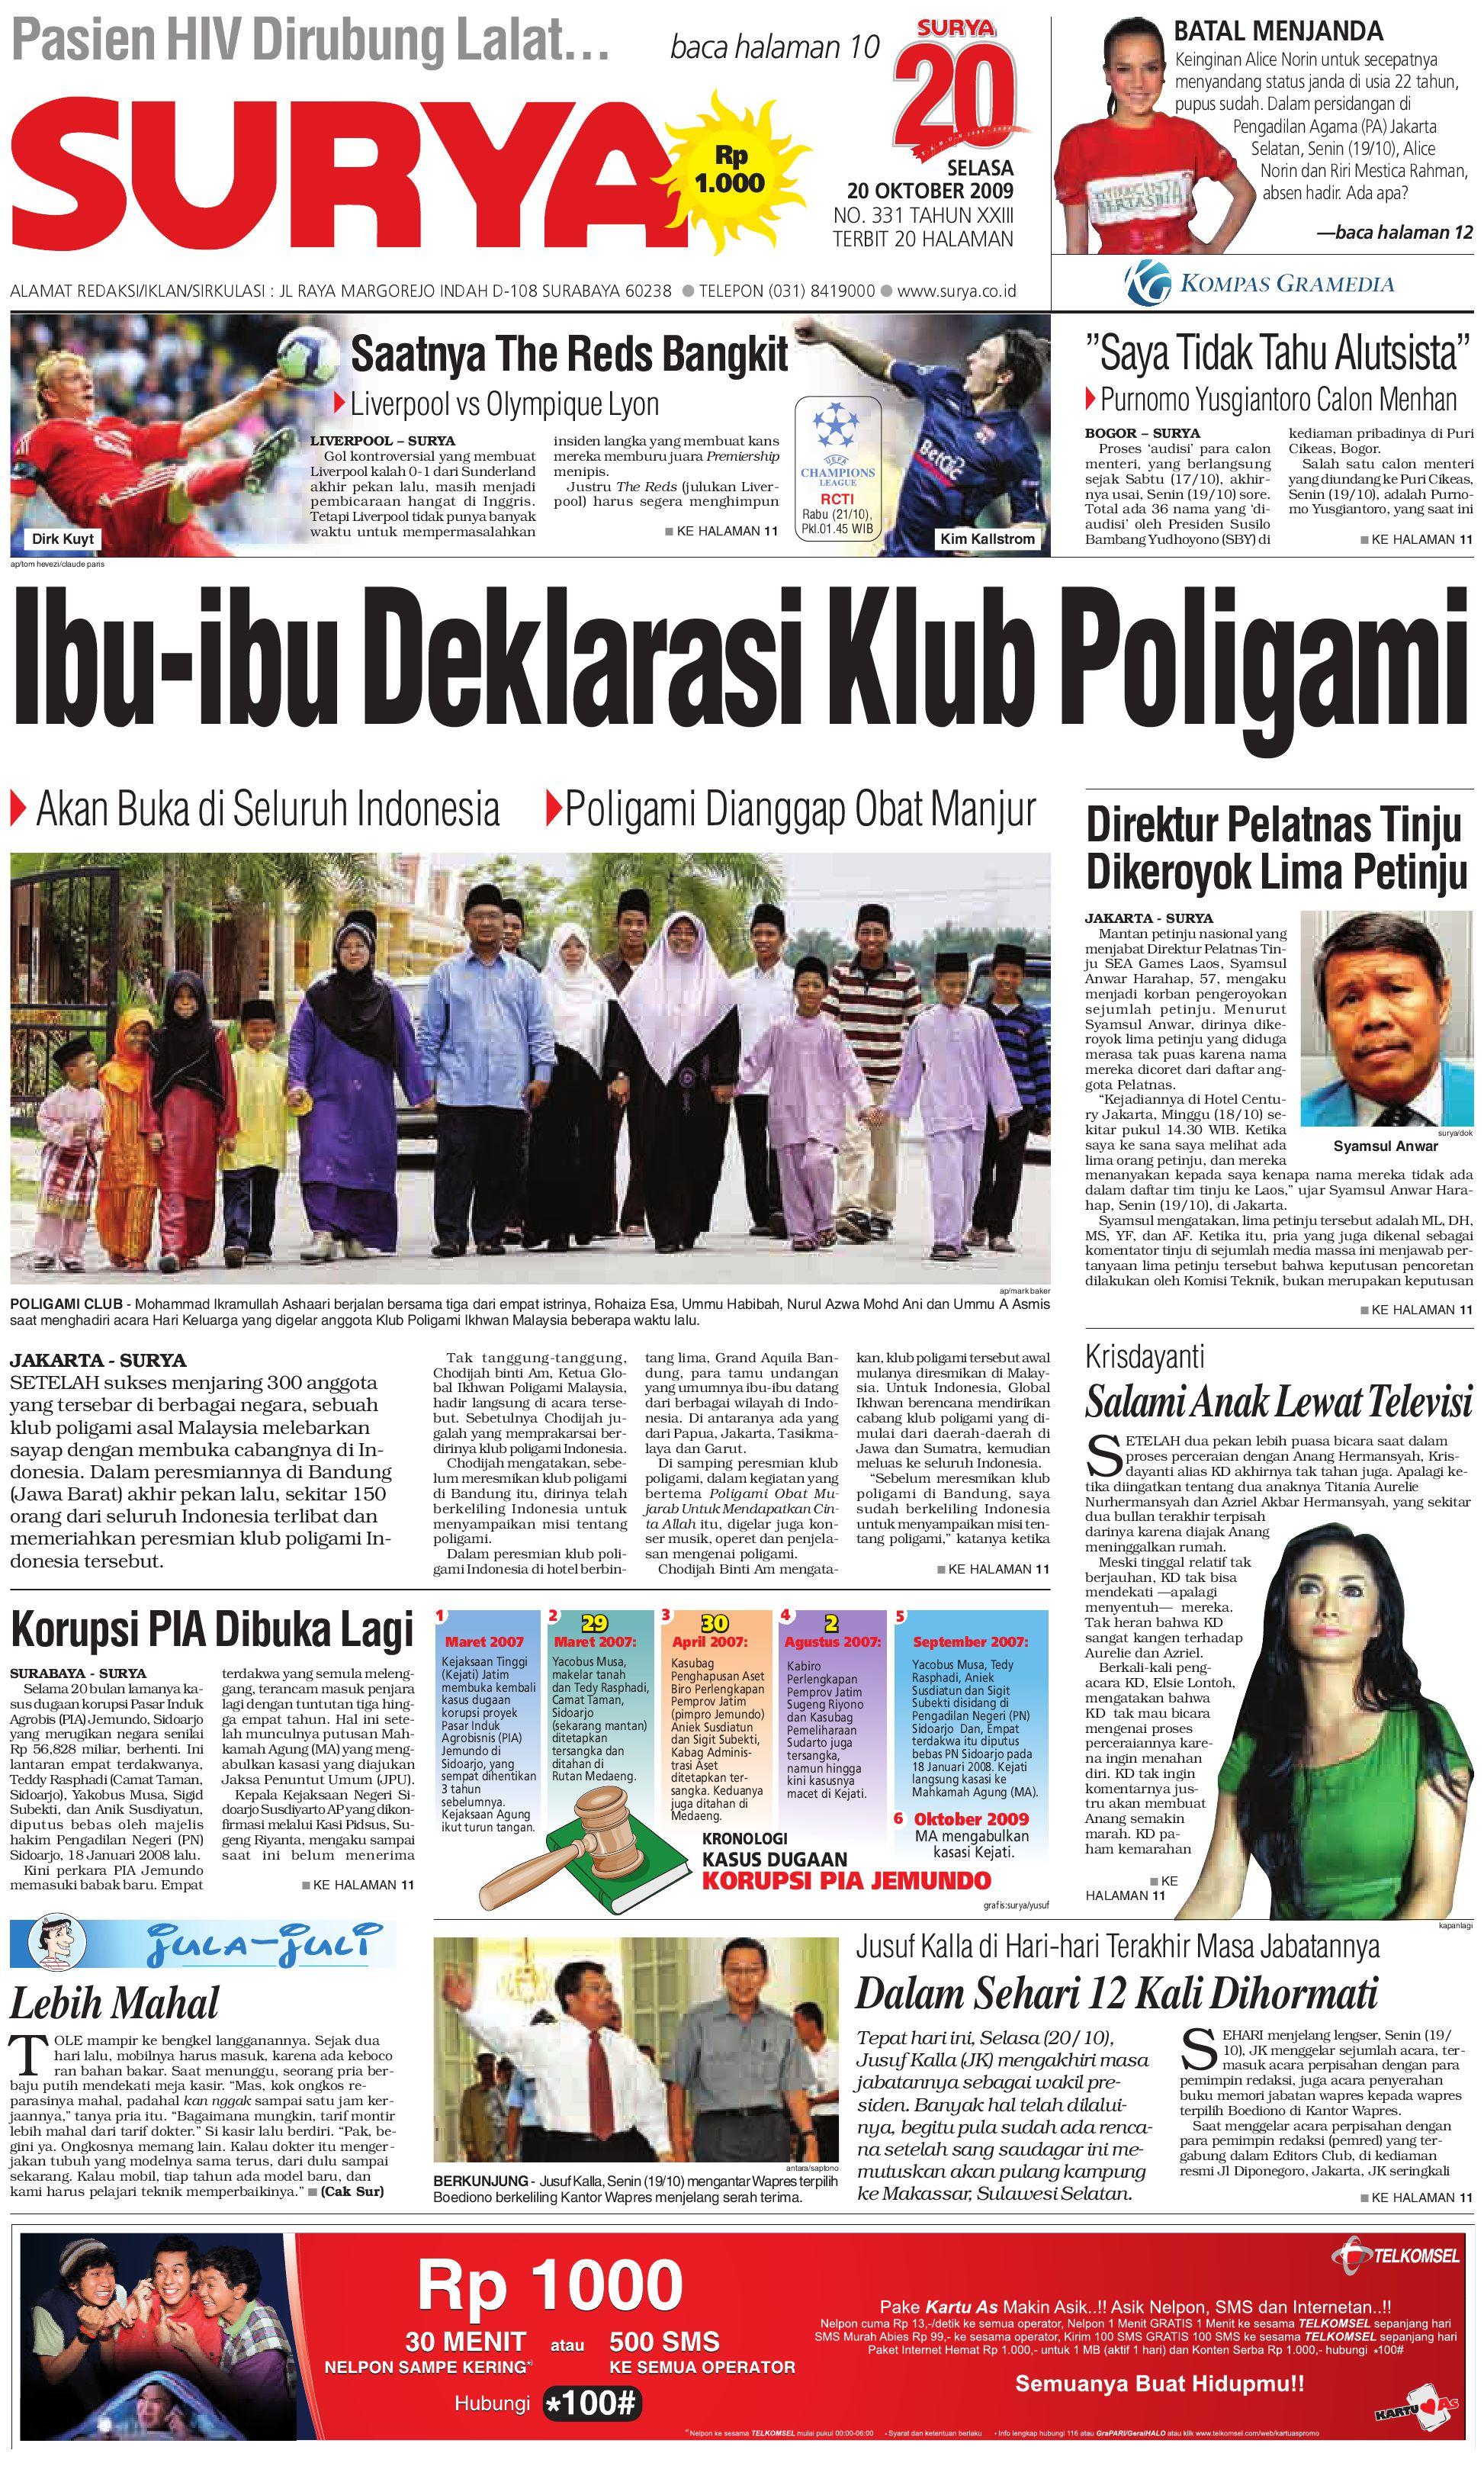 Surya Edsi Cetak 20 Okt 2009 By Harian Issuu Jersey Sepeda Mtb Str Indonesia Prima Bahan Tidak Panas